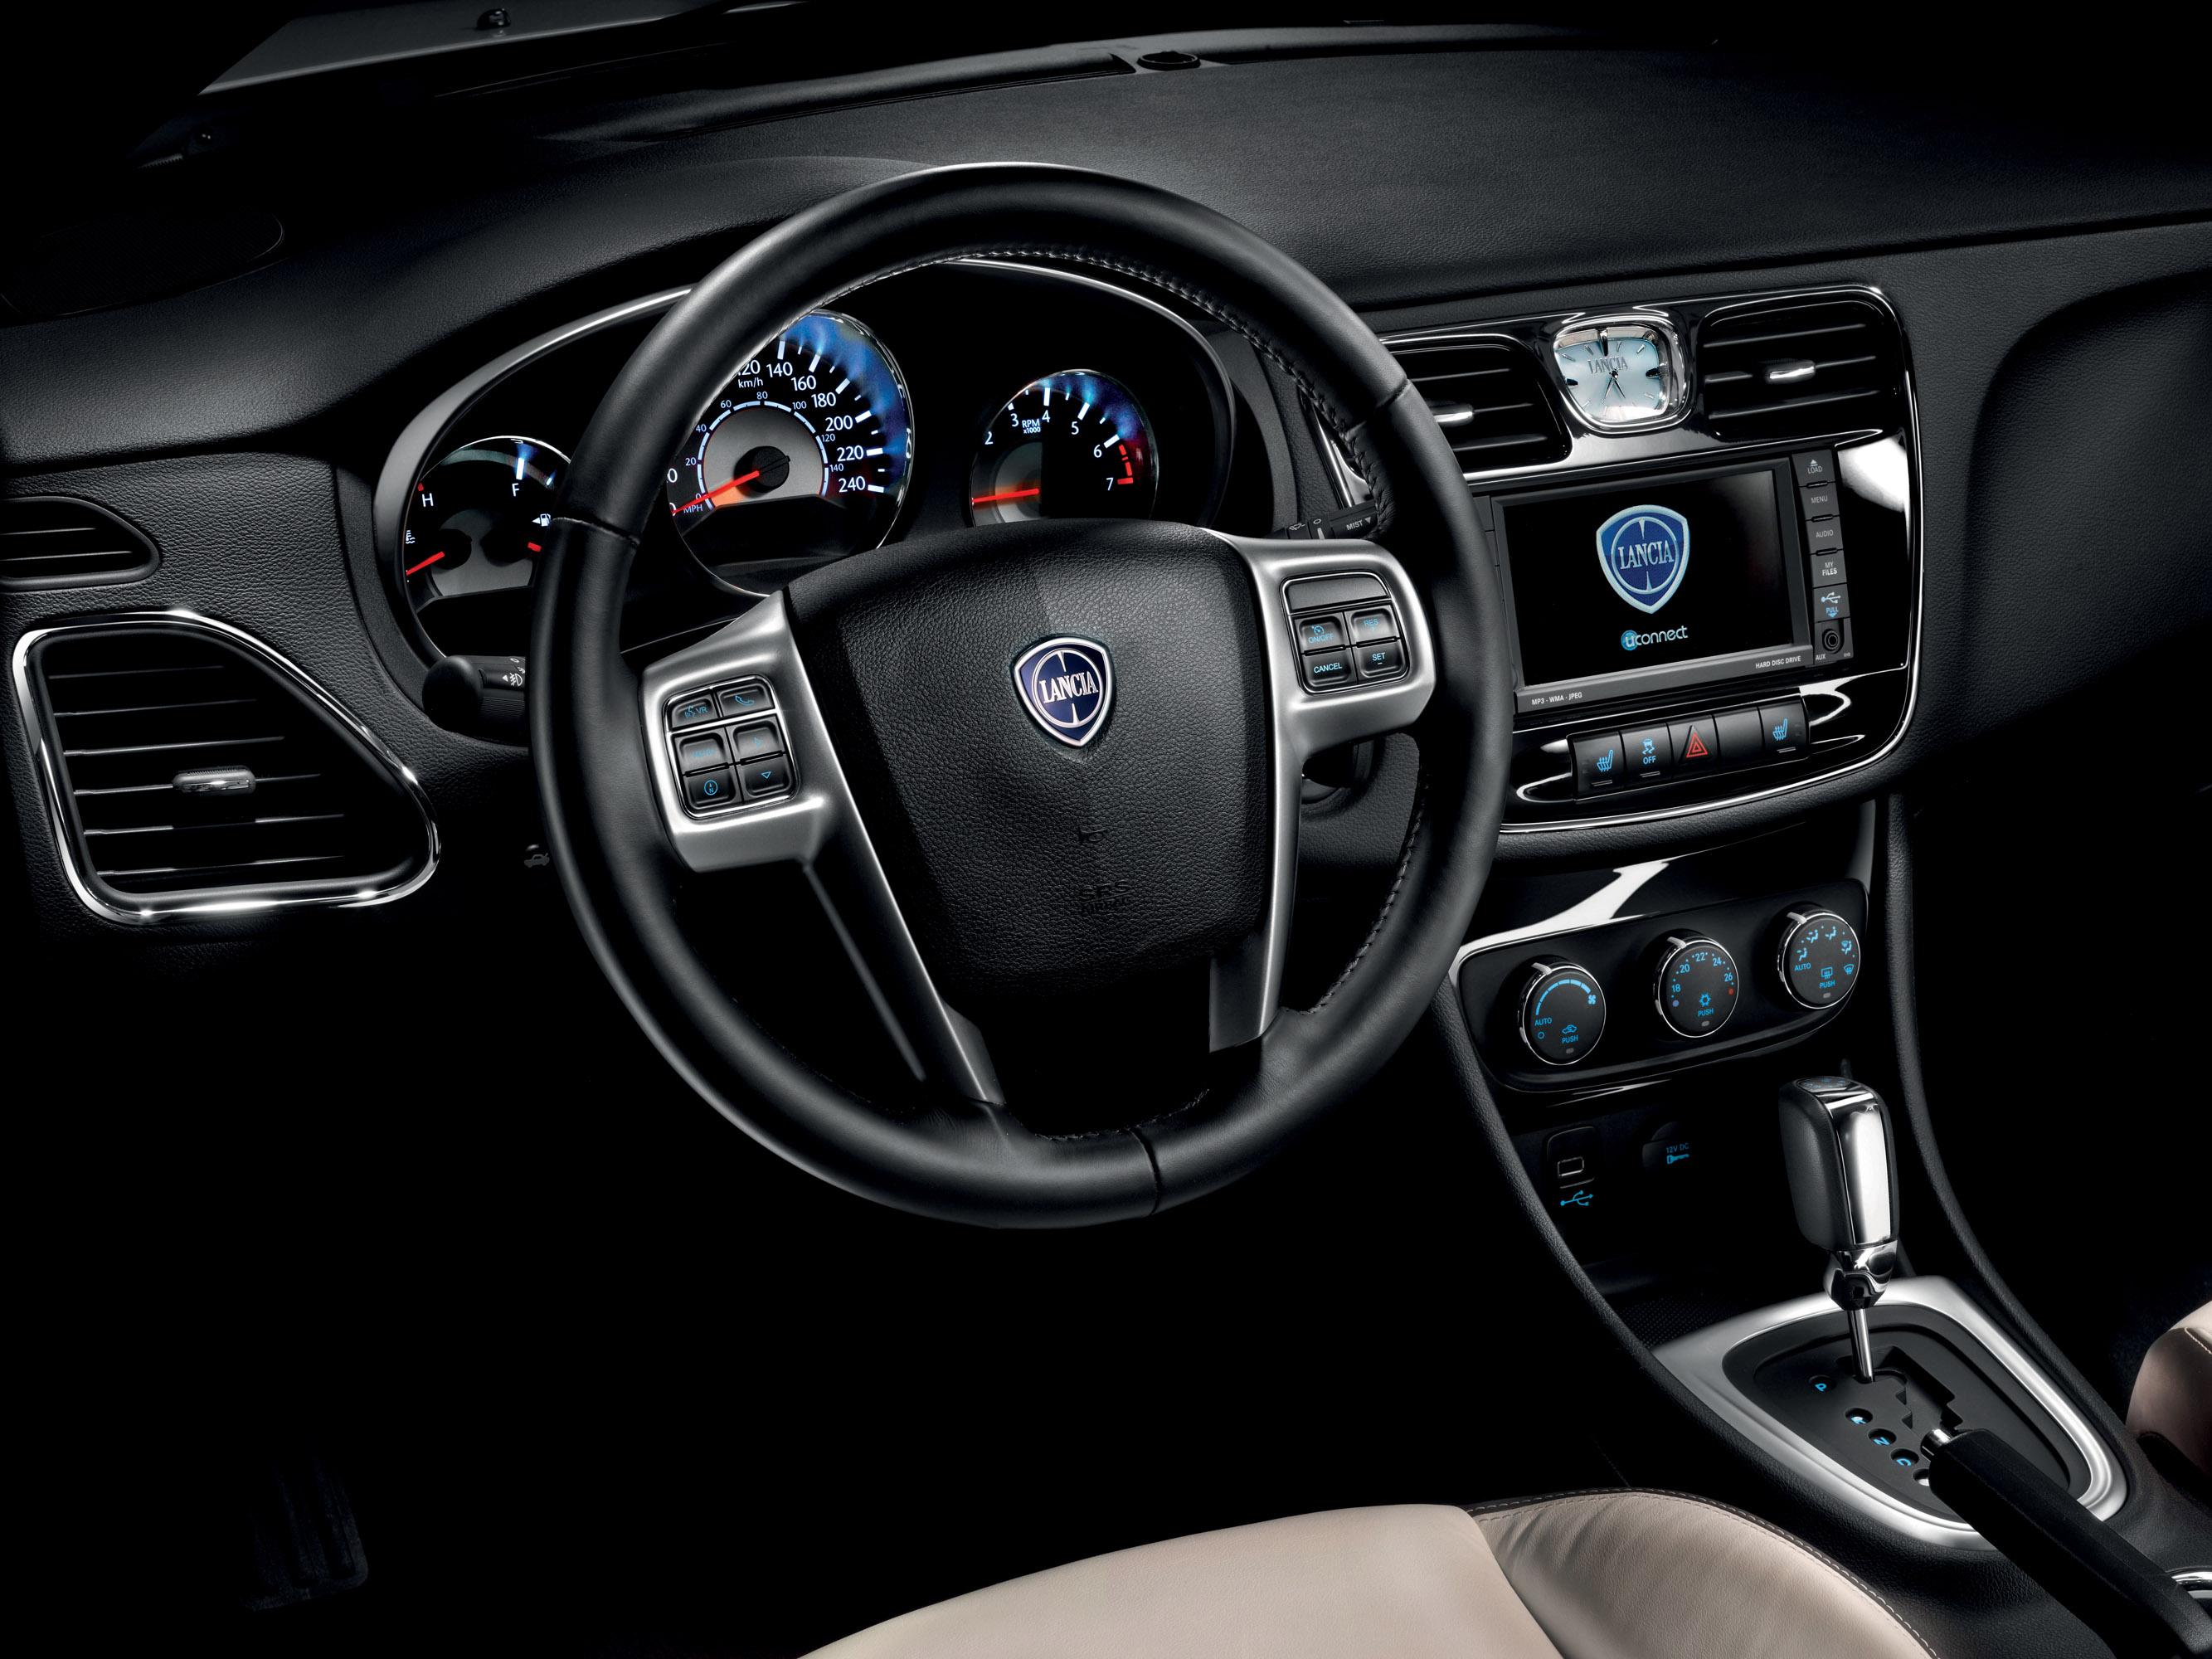 Italian Car Brands - on Car Brands